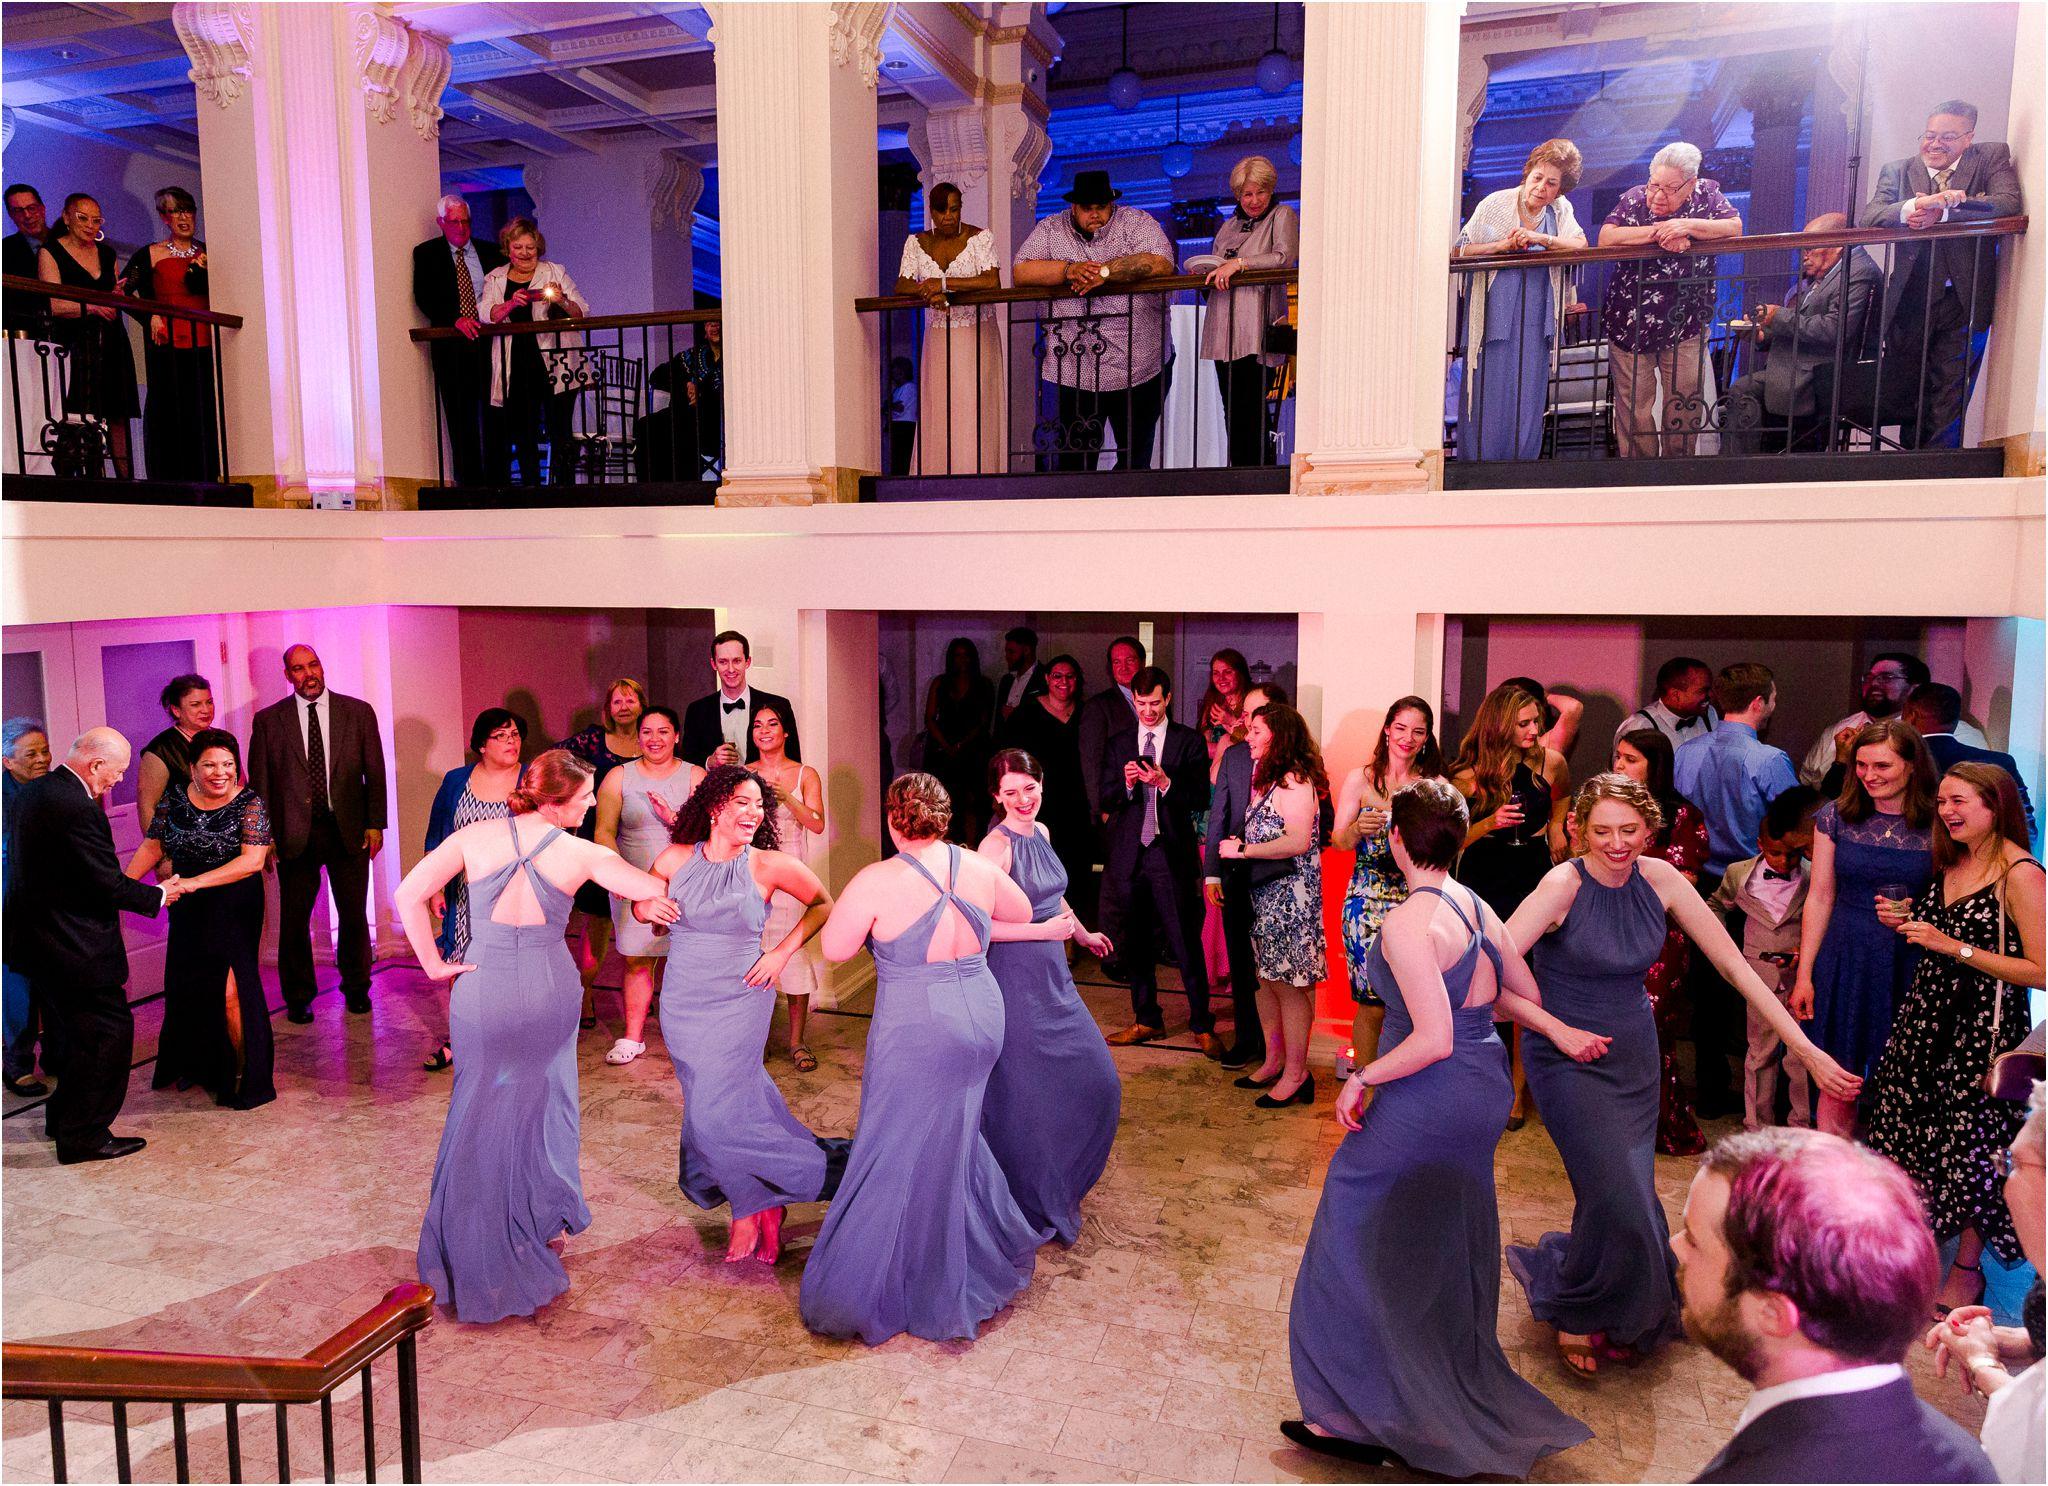 providence-public-library-wedding-images_00051.JPG